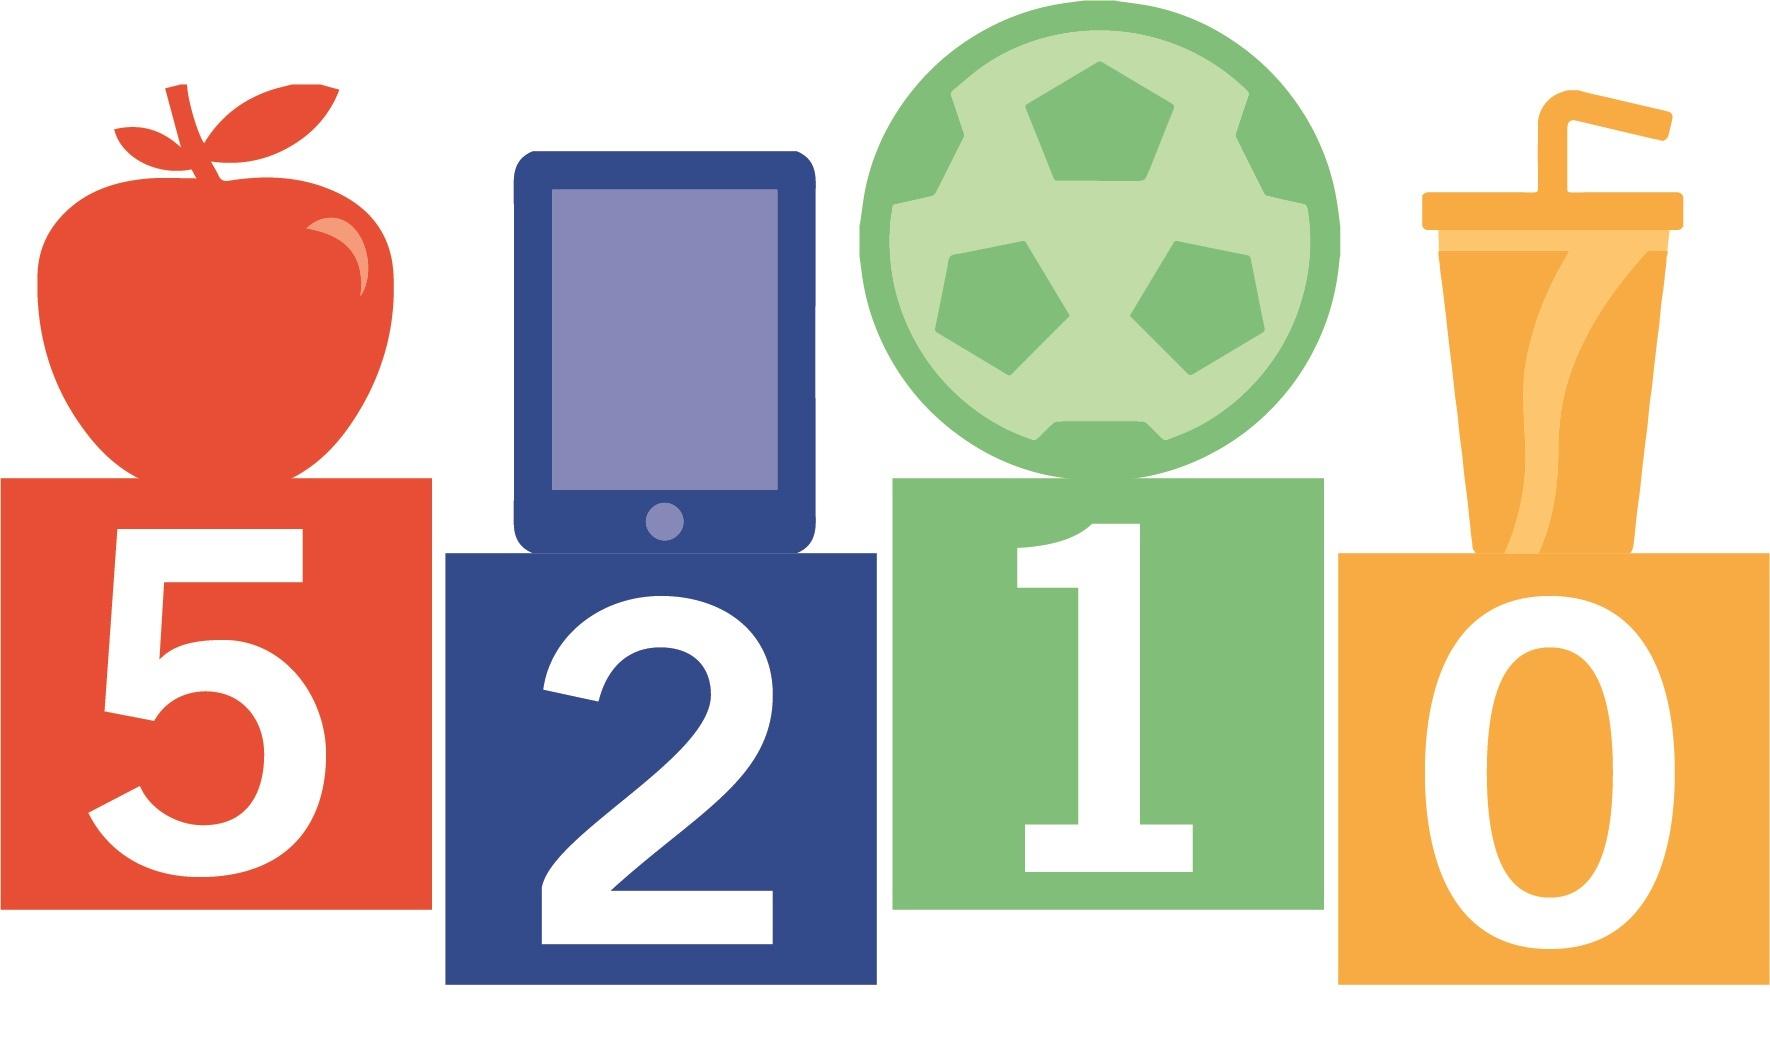 5210 logo.jpg